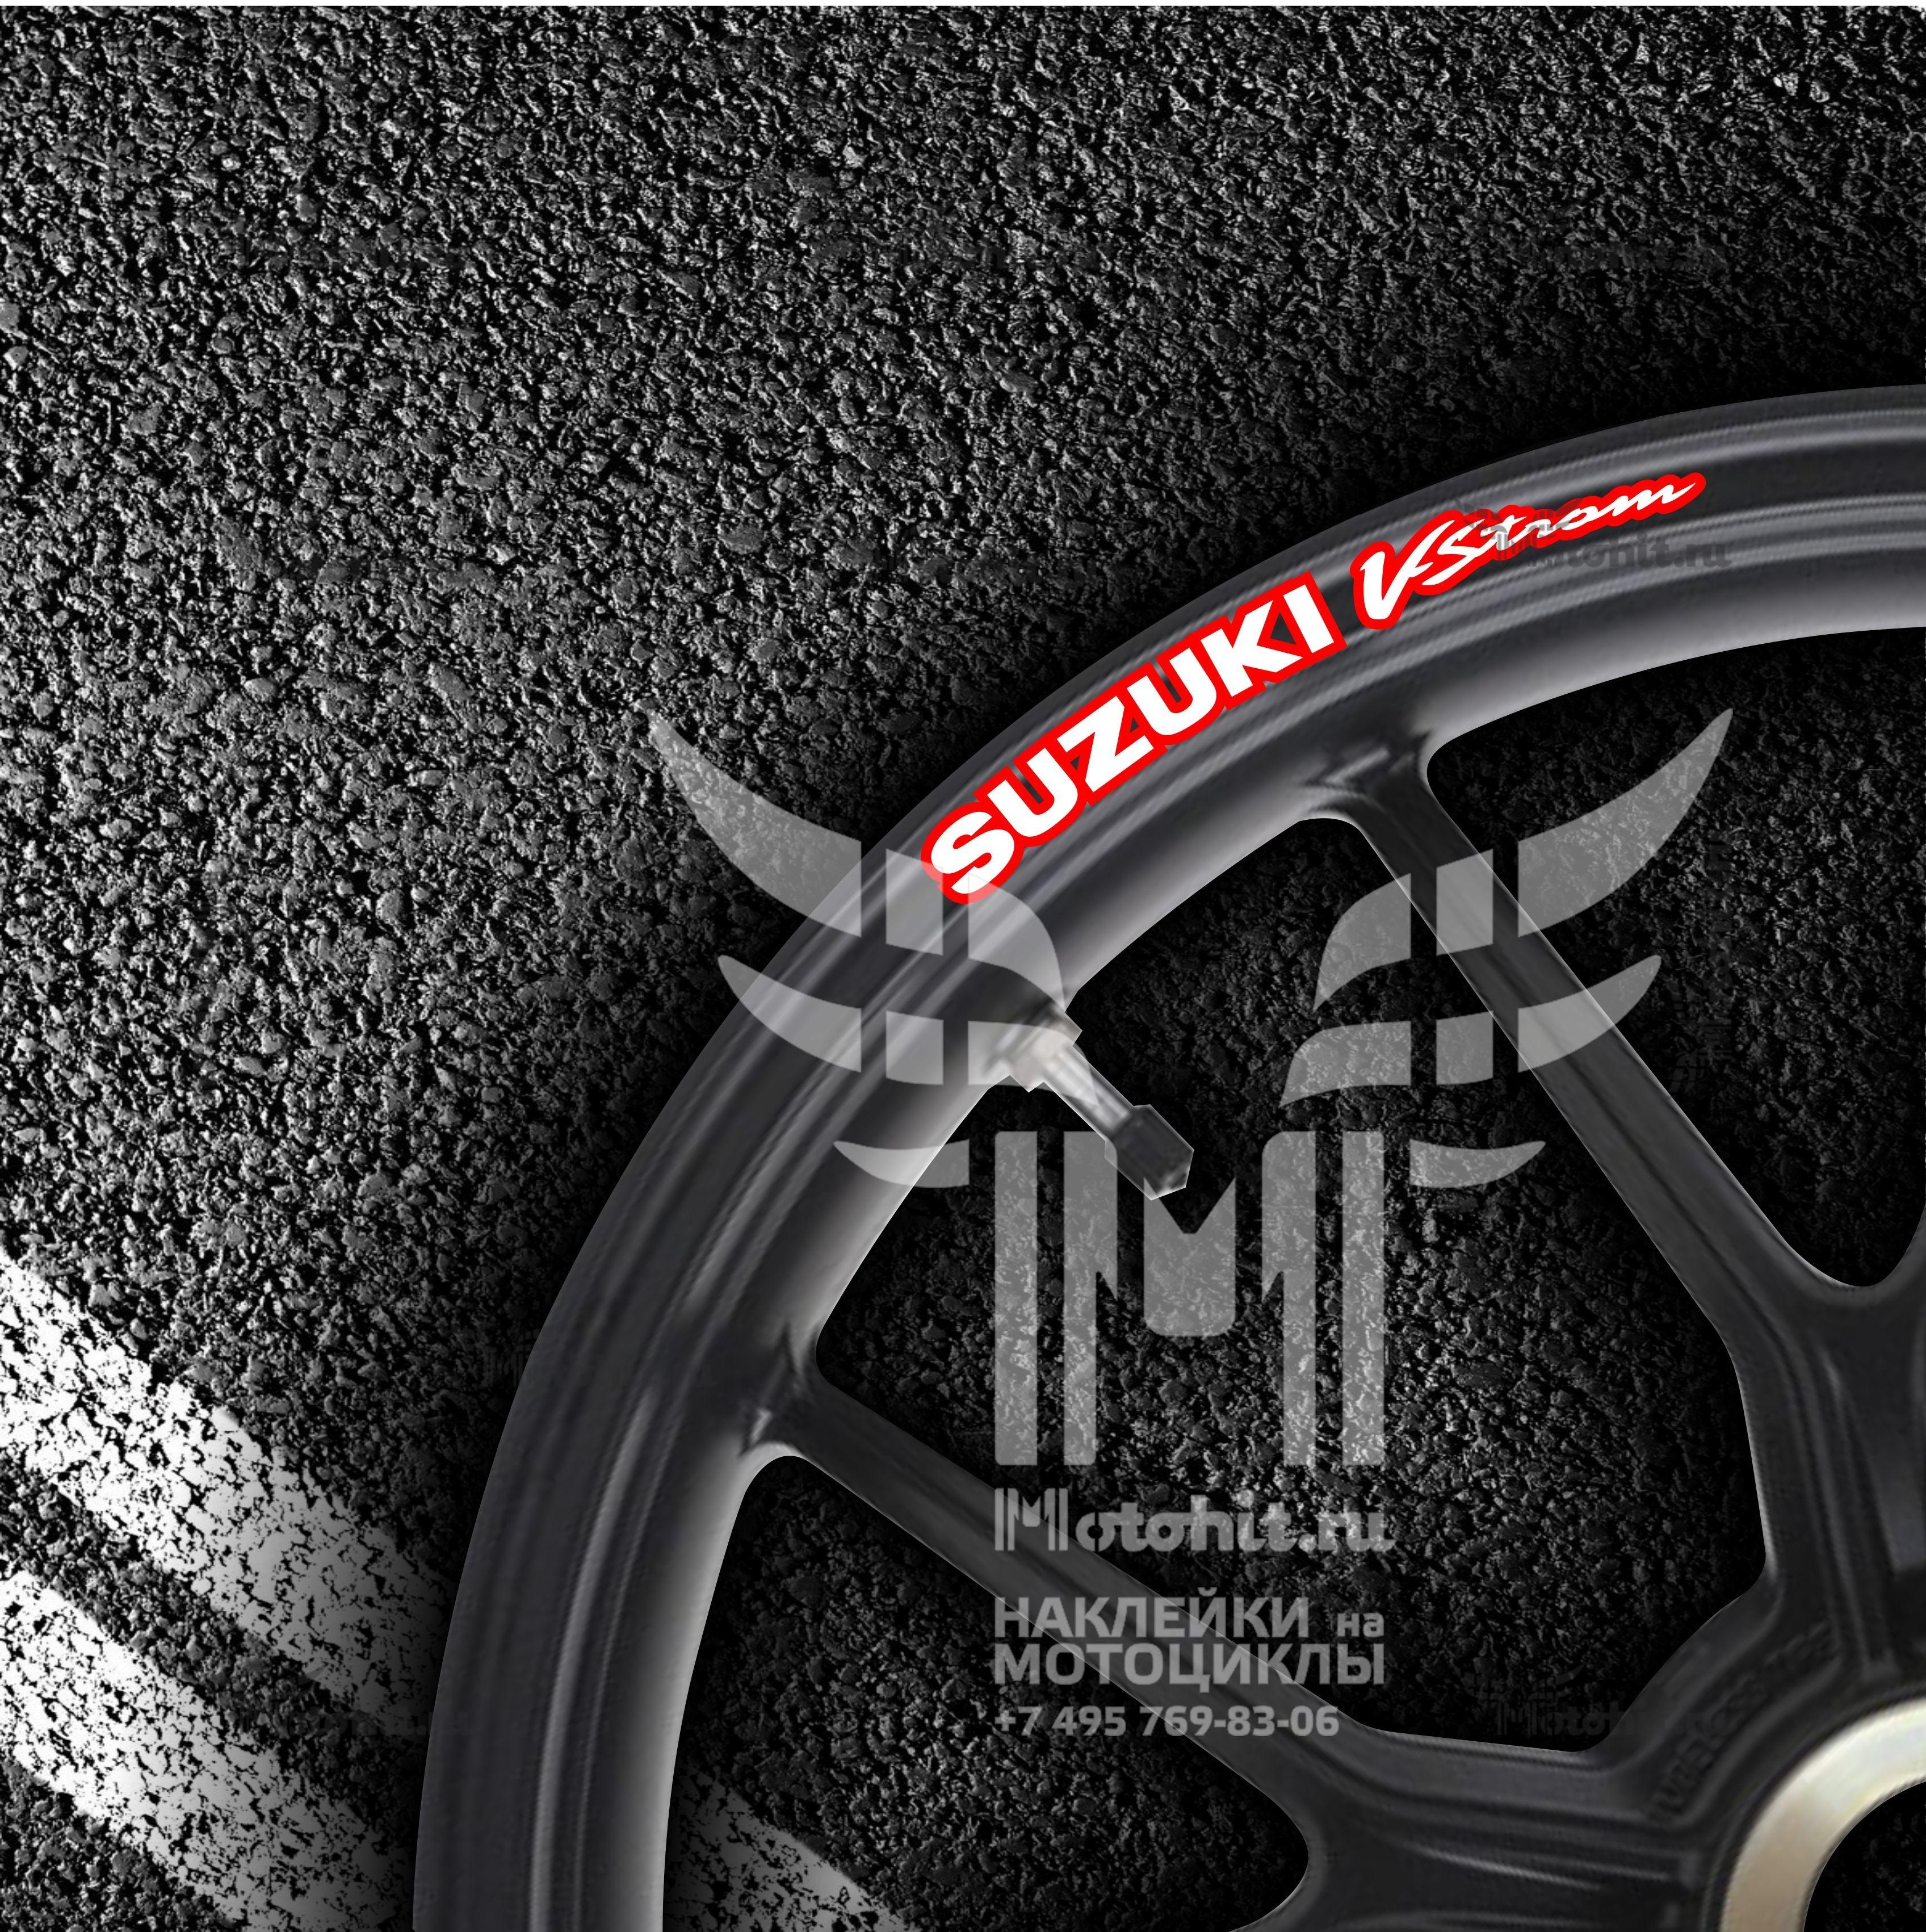 Комплект наклеек на обод колеса мотоцикла SUZUKI VSTROM